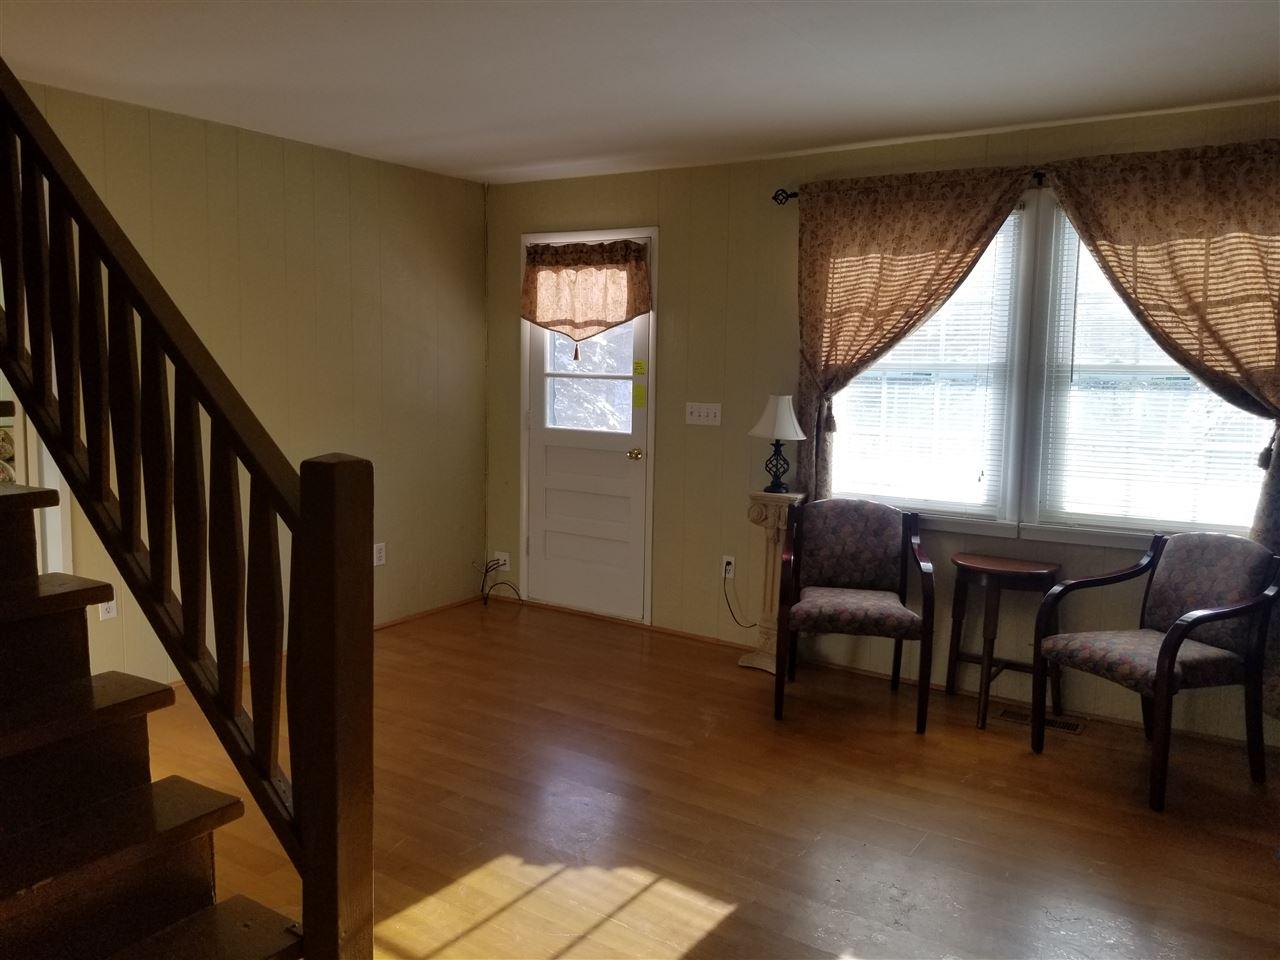 Living Room 11300821